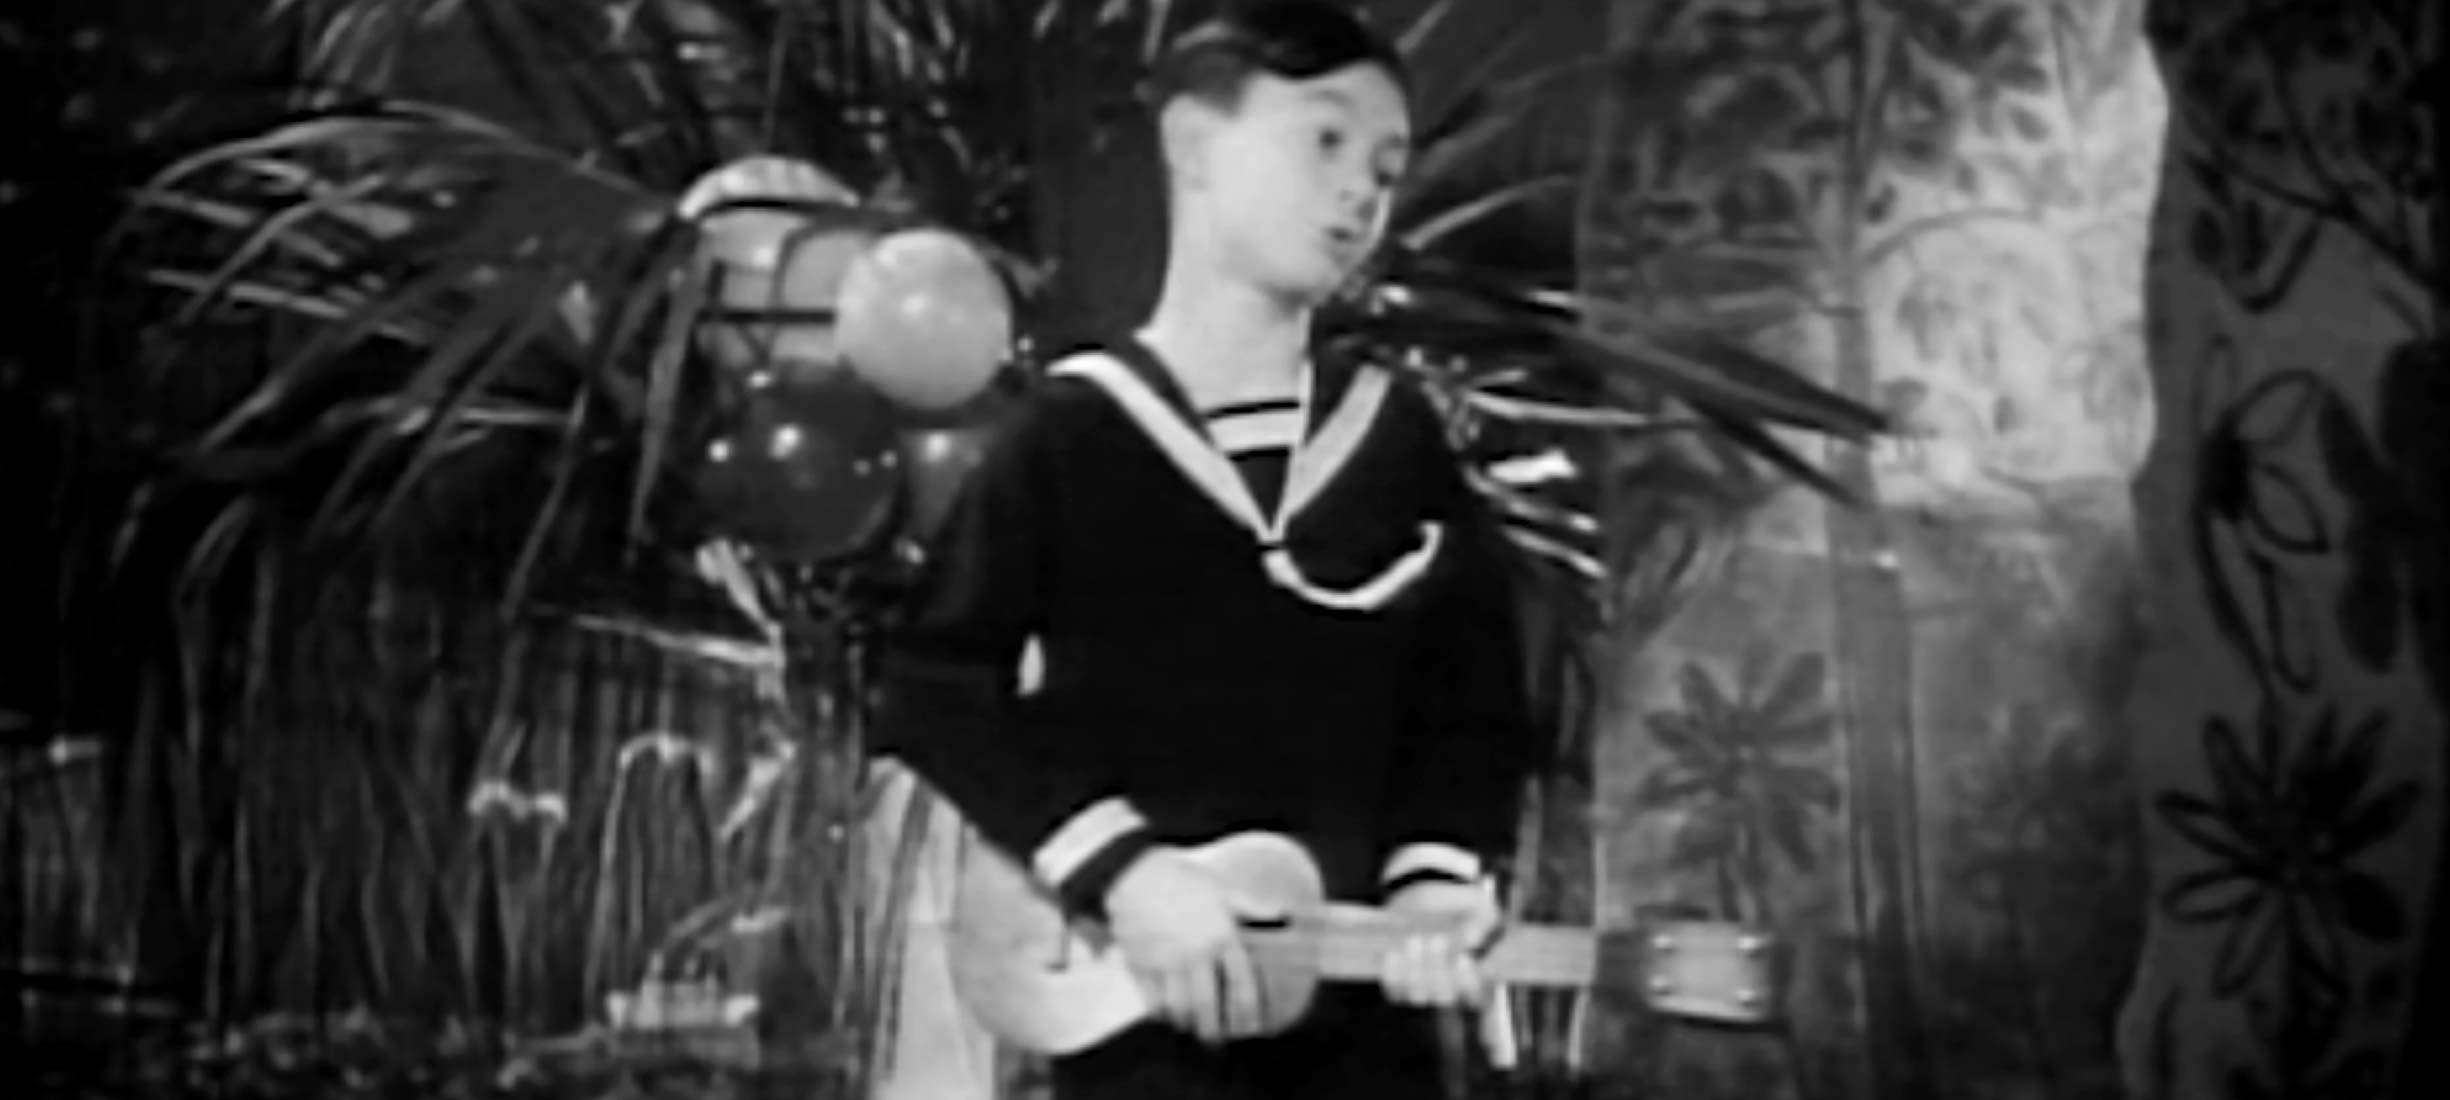 Rascals Follies of 1938